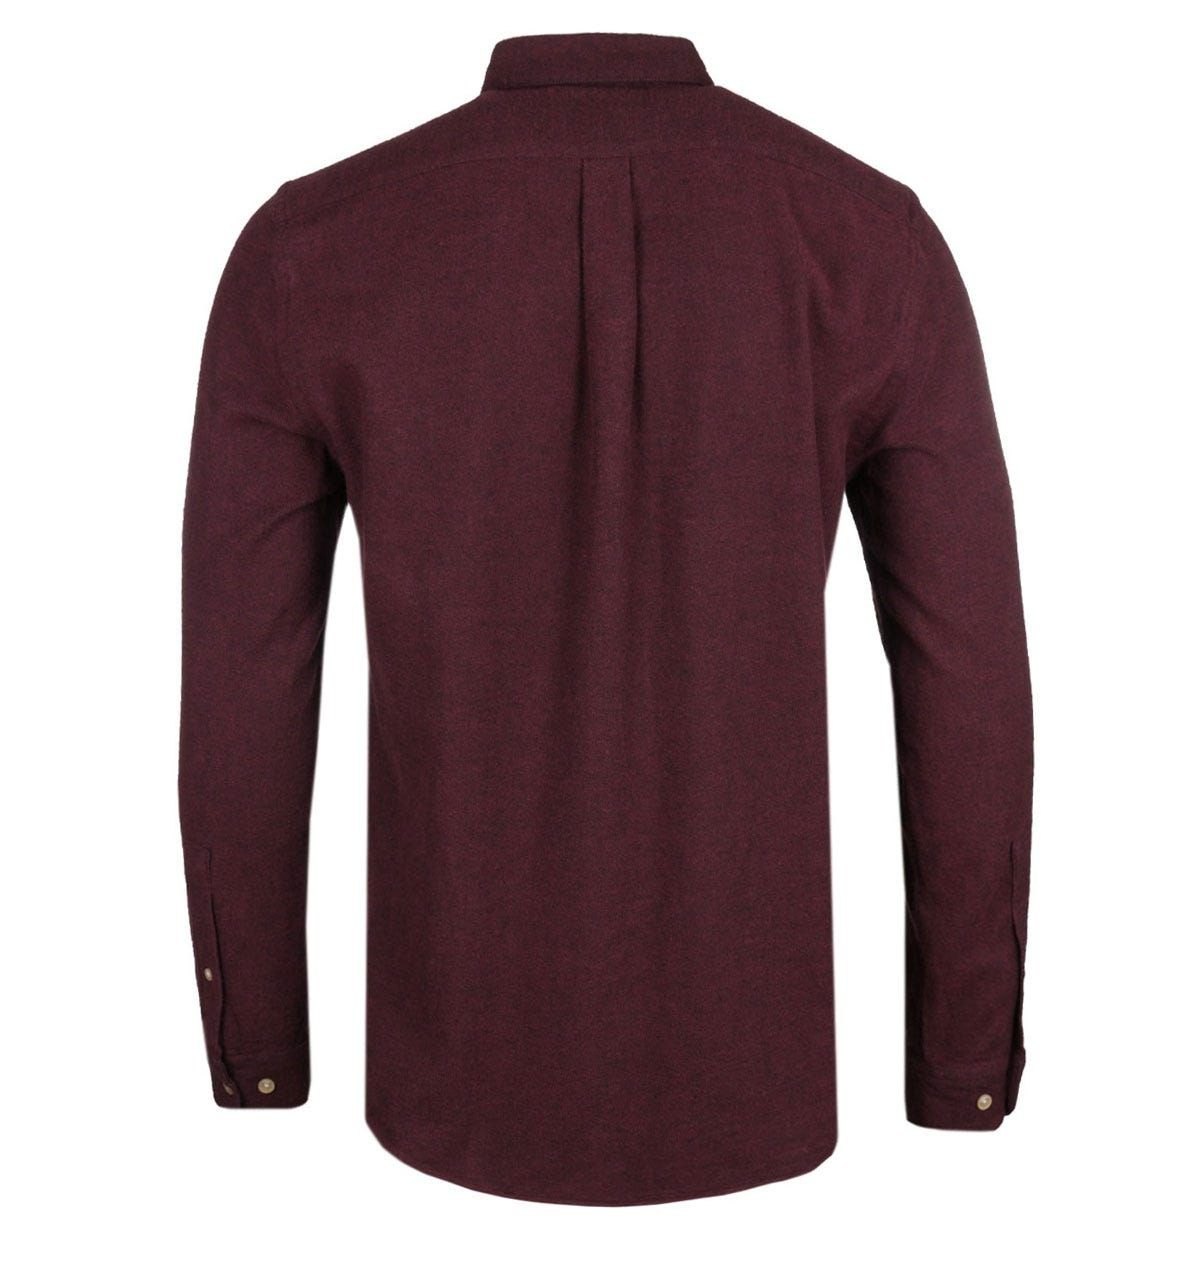 Portuguese Flannel Teca Bordeaux Long Sleeve Shirt